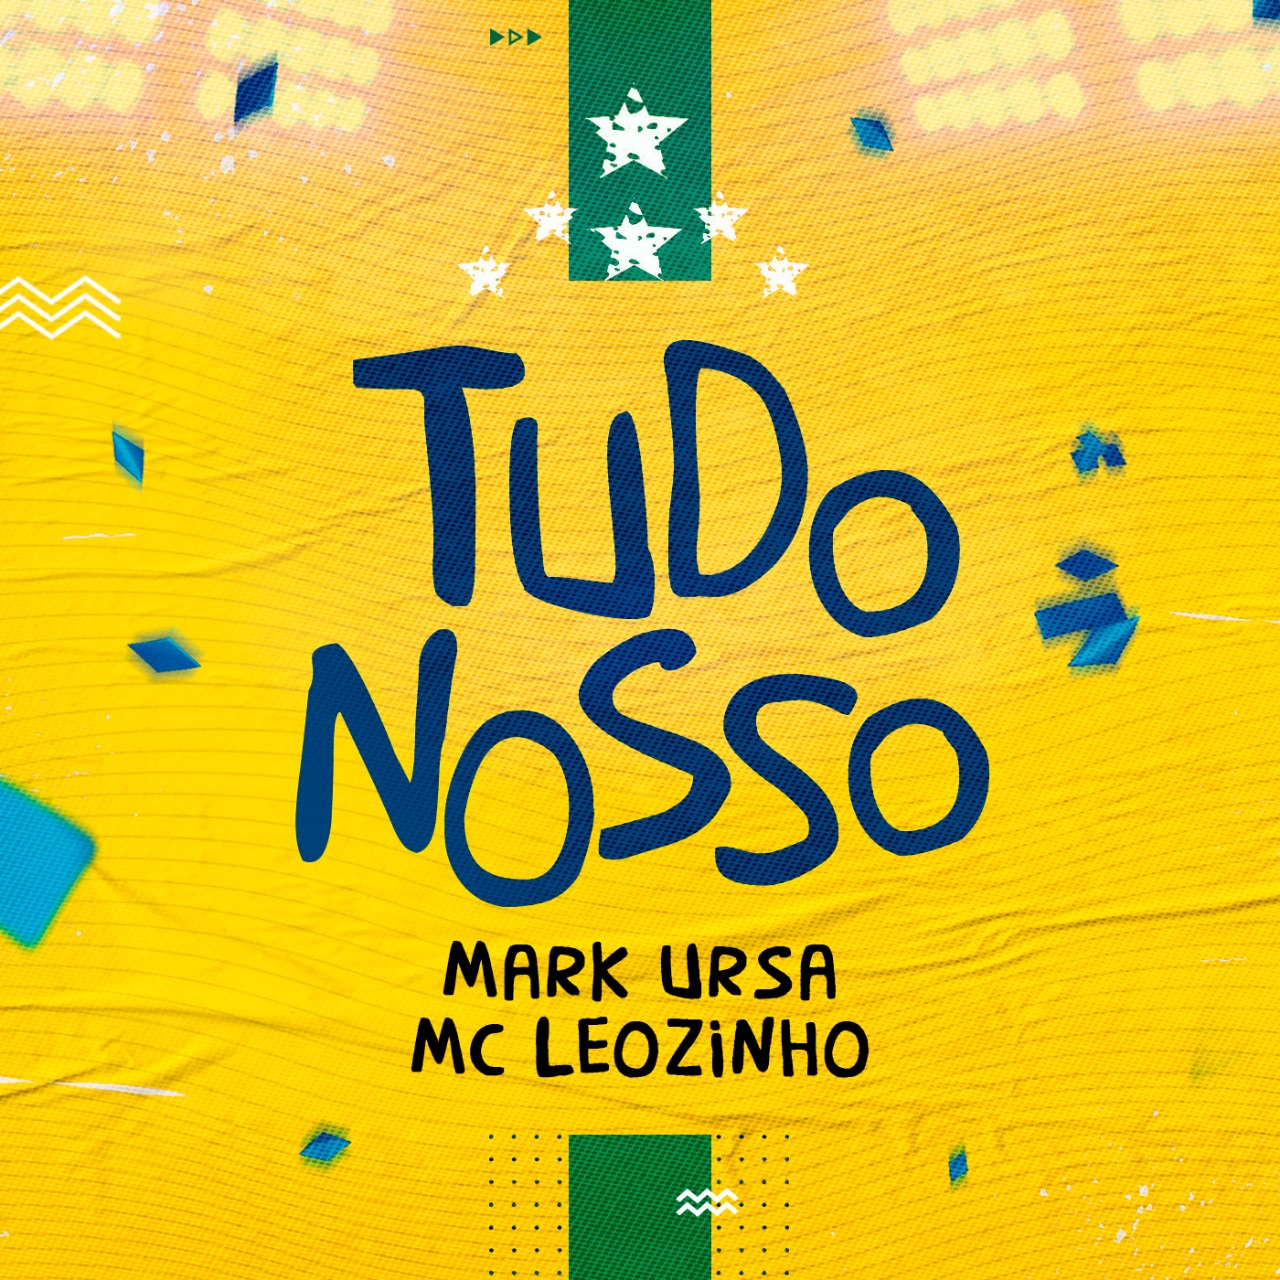 Copy of Mark Ursa, MC Leozinho